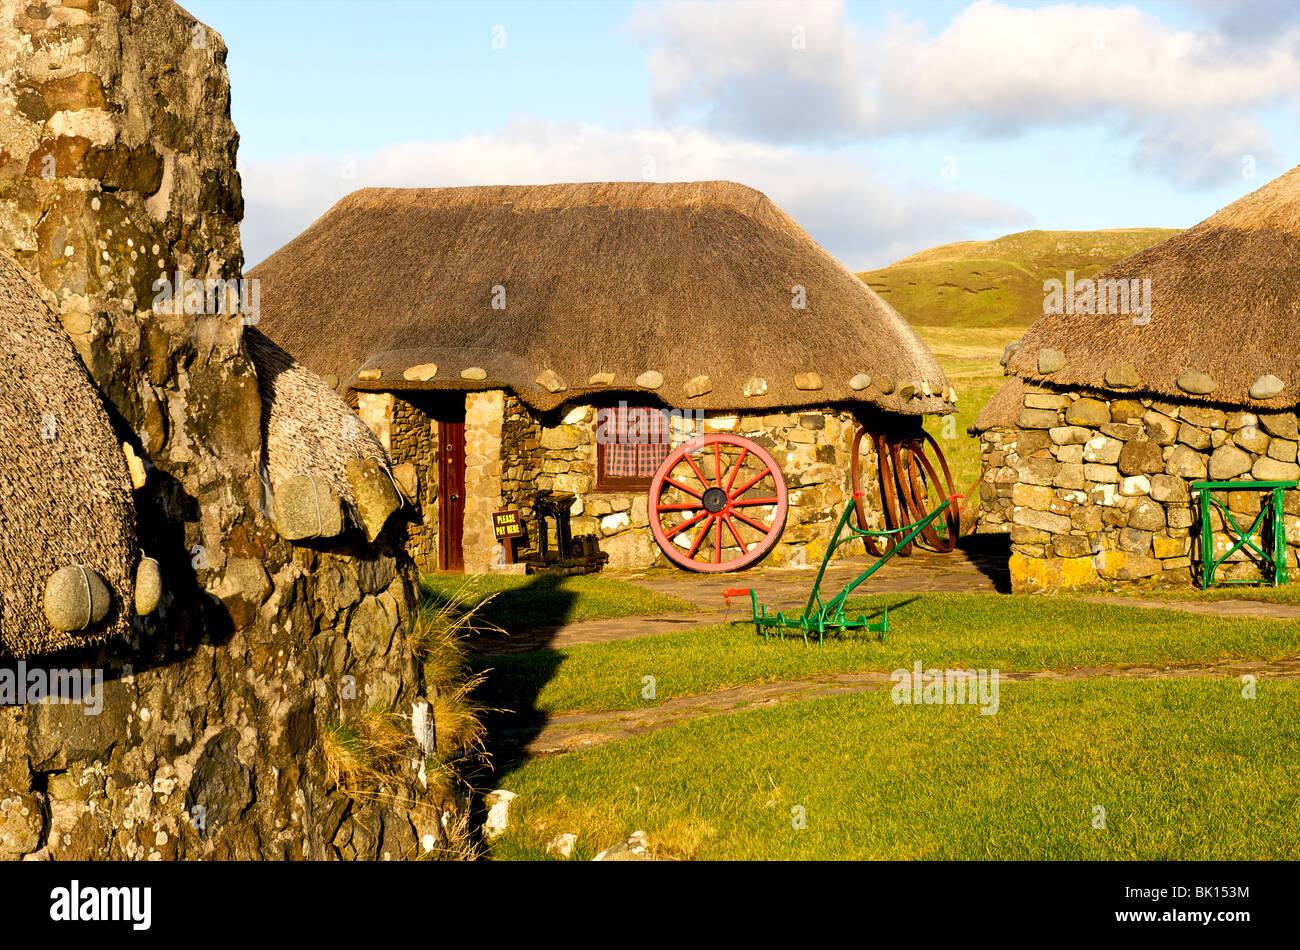 Scotland, Skye island, Croft Museum - Stock Image